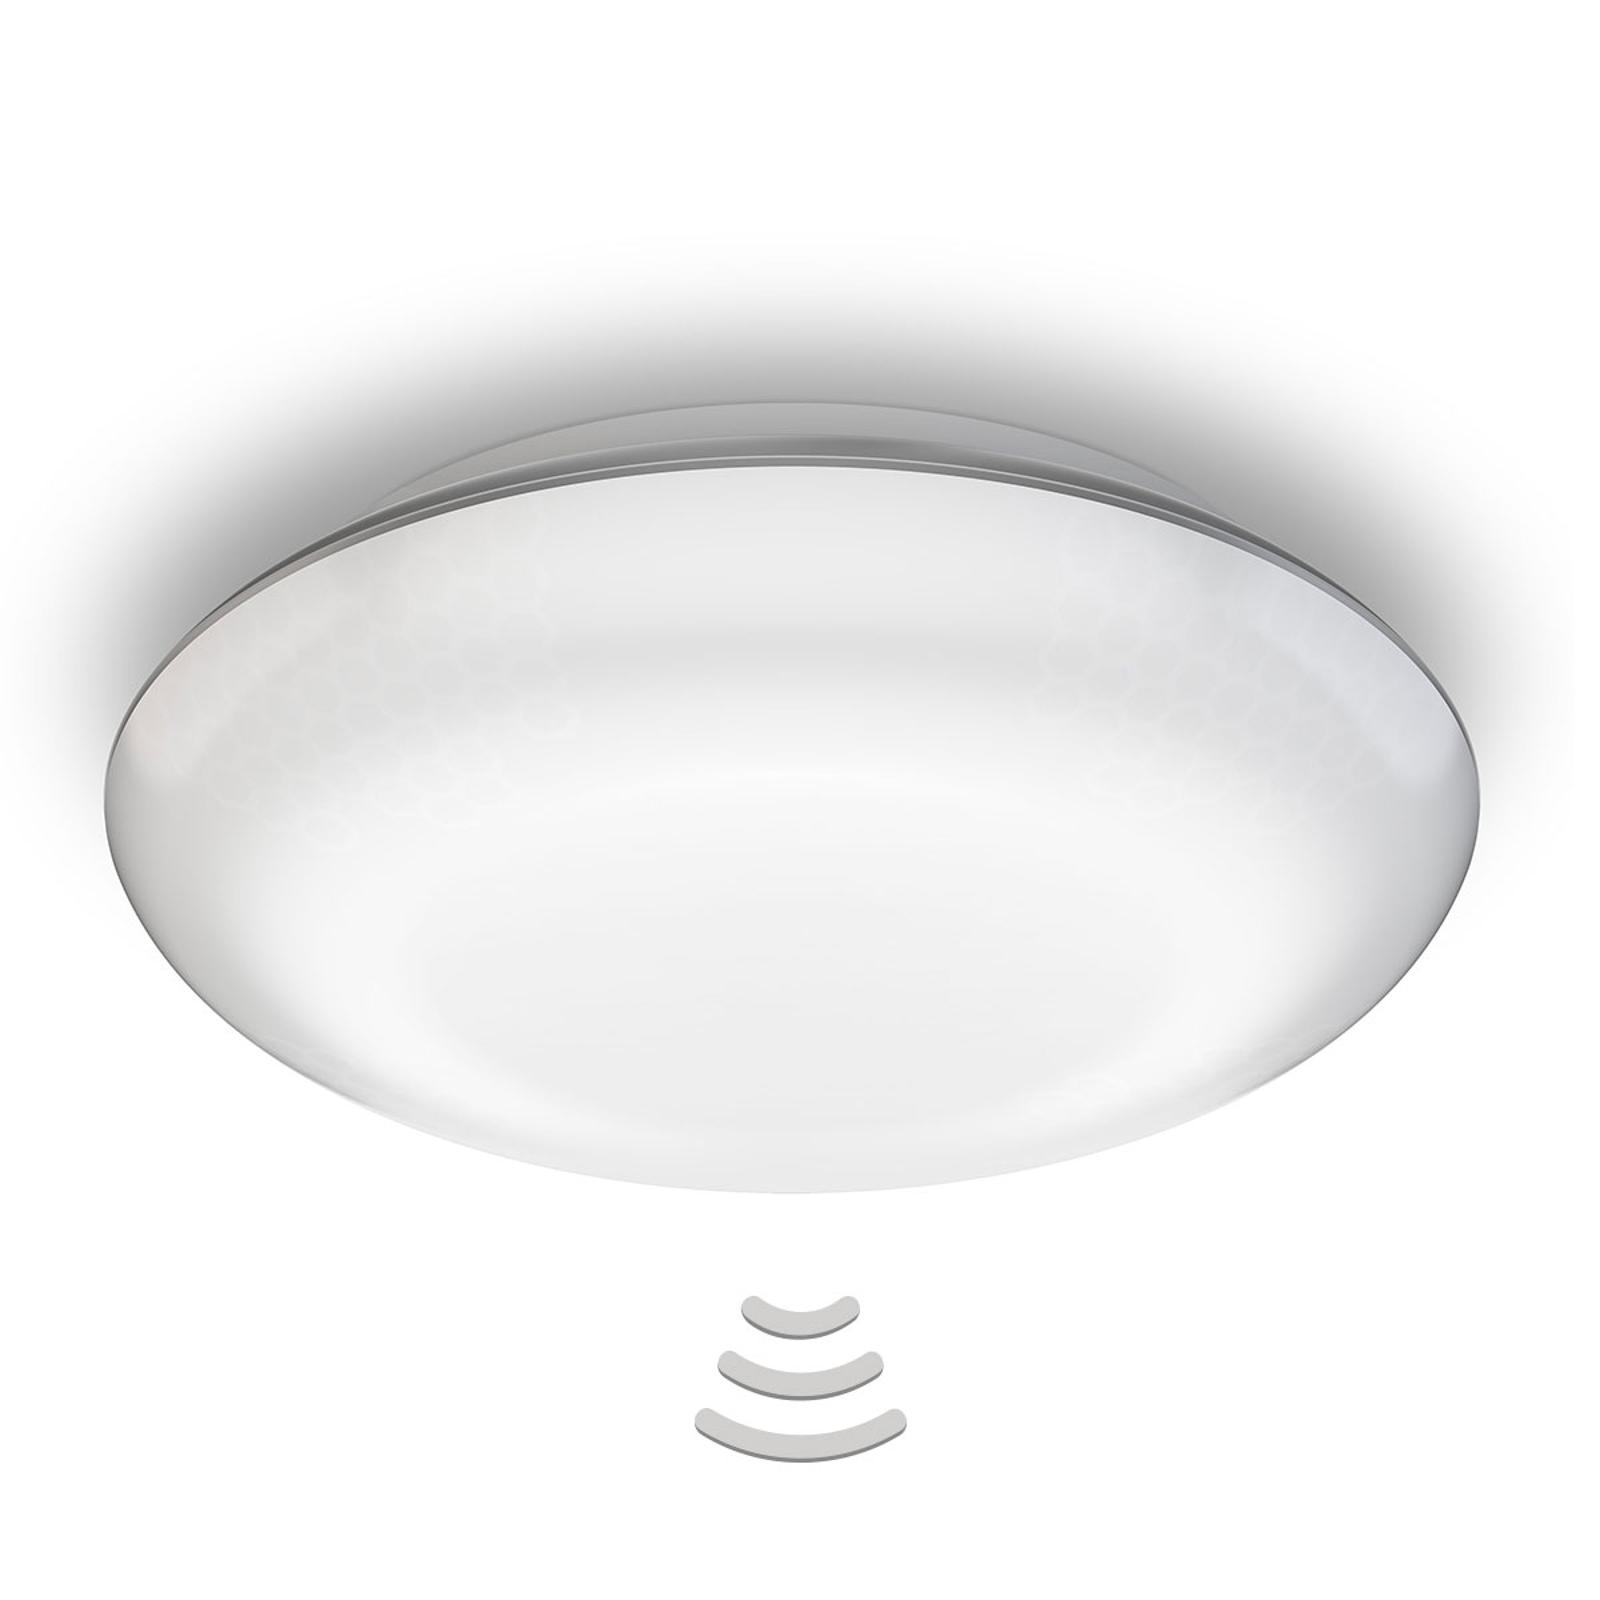 STEINEL DL Vario Quattro -LED-kattovalo, tunnistin